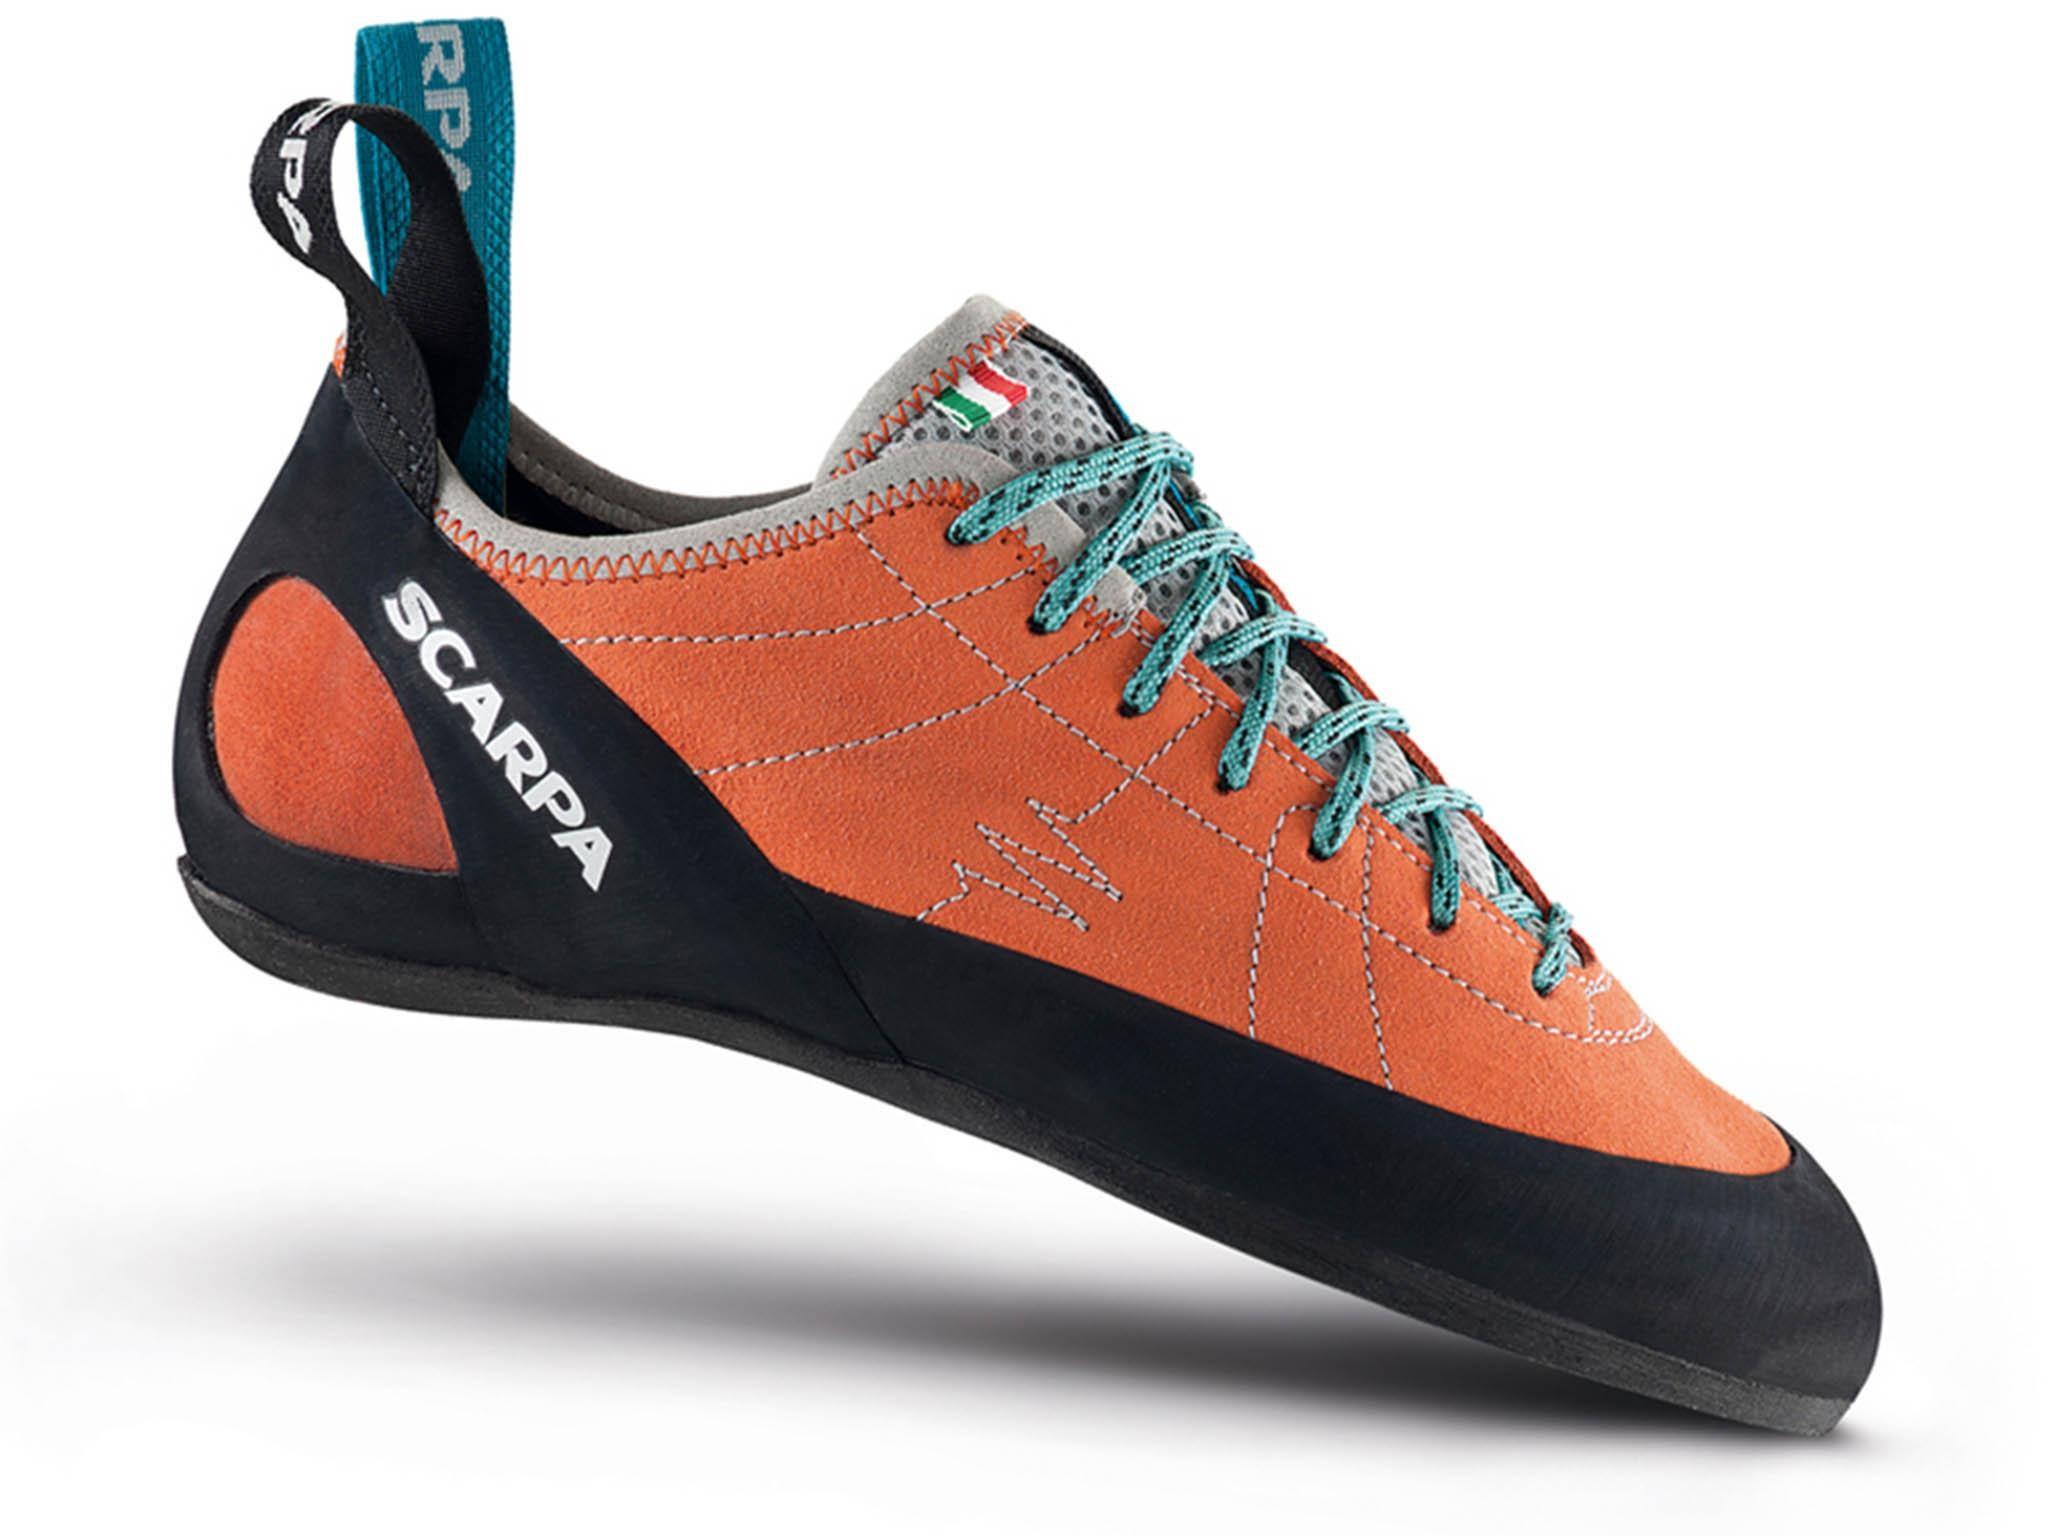 10 best women's climbing shoes | The